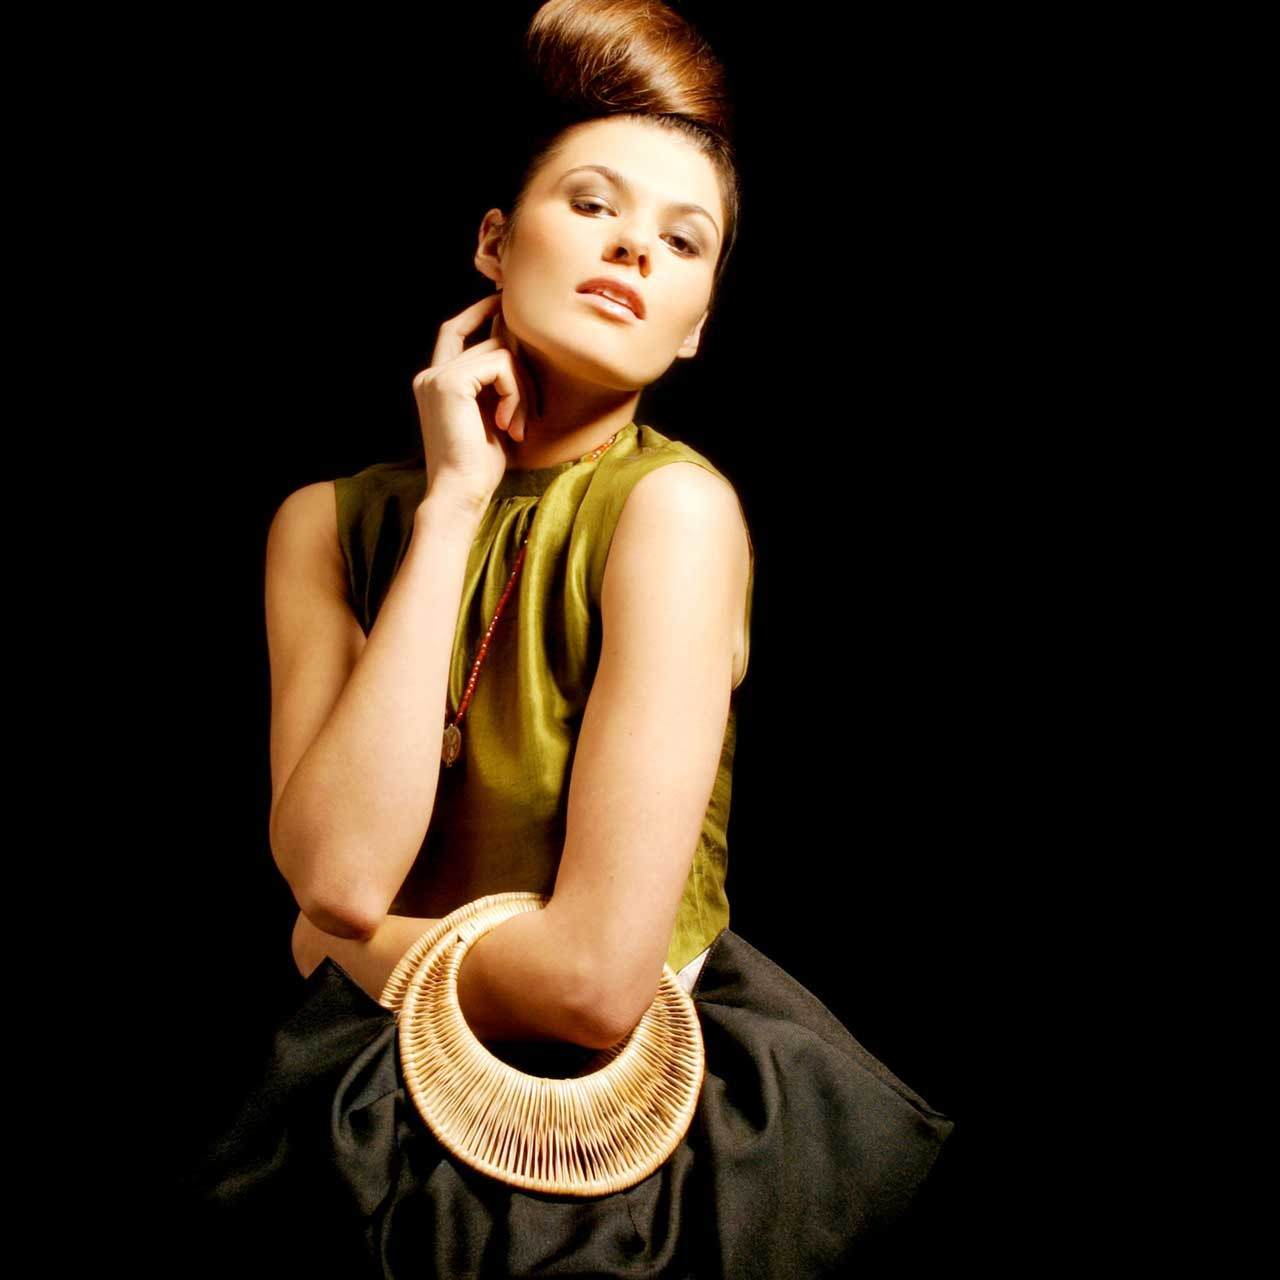 Laure-Maud_Ethical-Fashion_Show_07_Numanu_ZaZa-Factory_Ombre-Claire